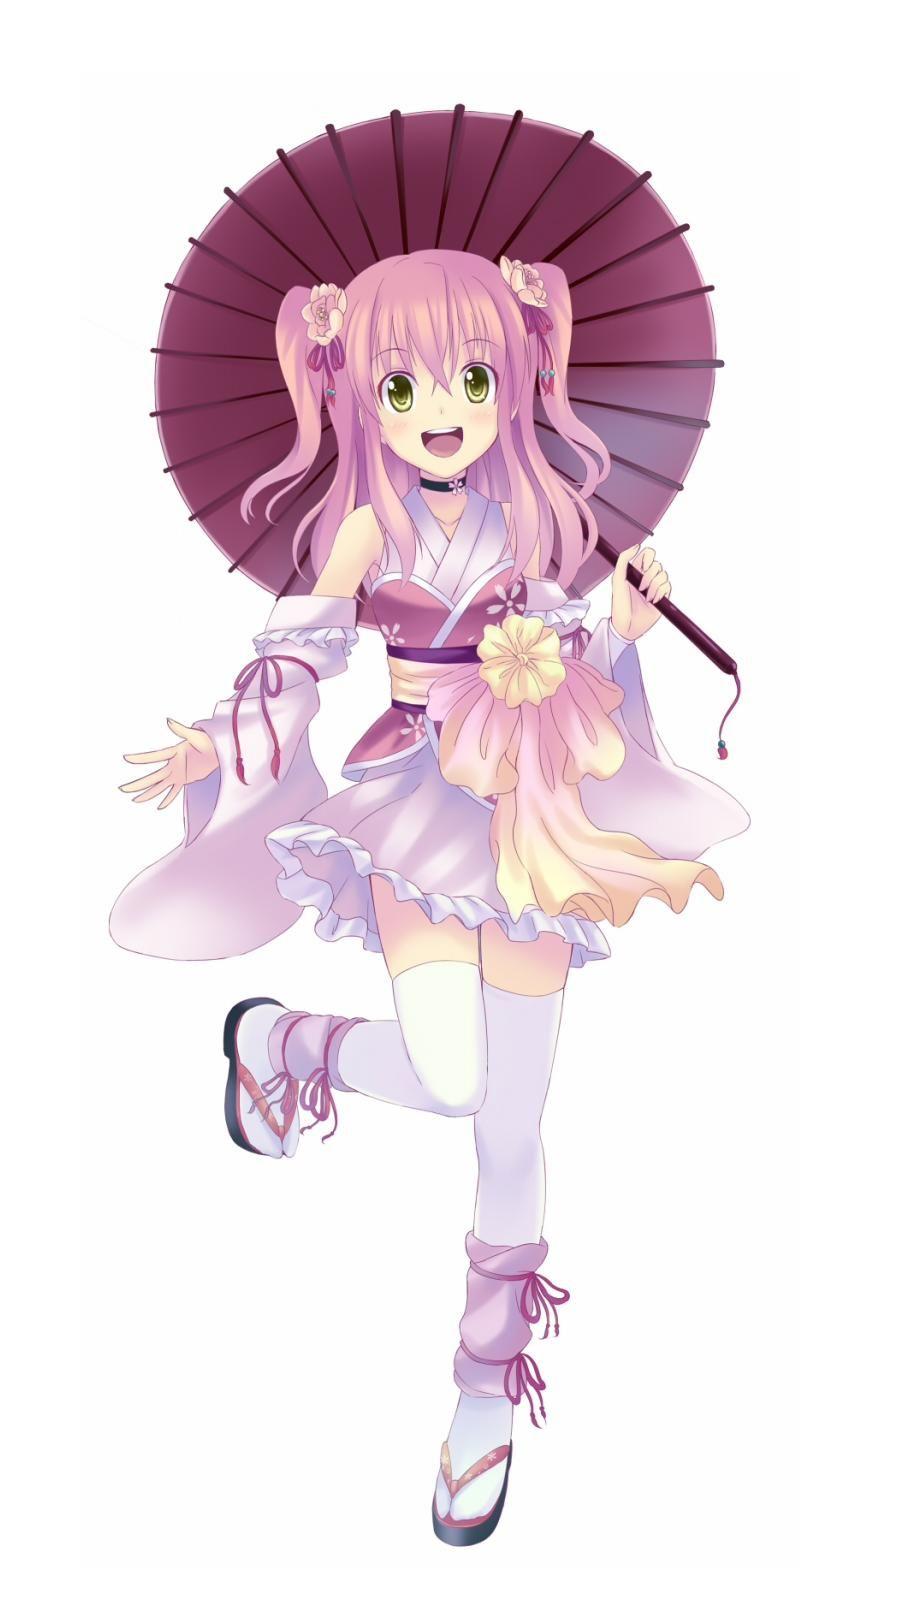 Wallpaper Kartun Anime Lucu Cute Anime Wallpaper For Android Apk Download Gambar Lucu Kartun Anime Kantor Meme Wal In 2020 Hd Anime Wallpapers Anime Anime Wallpaper